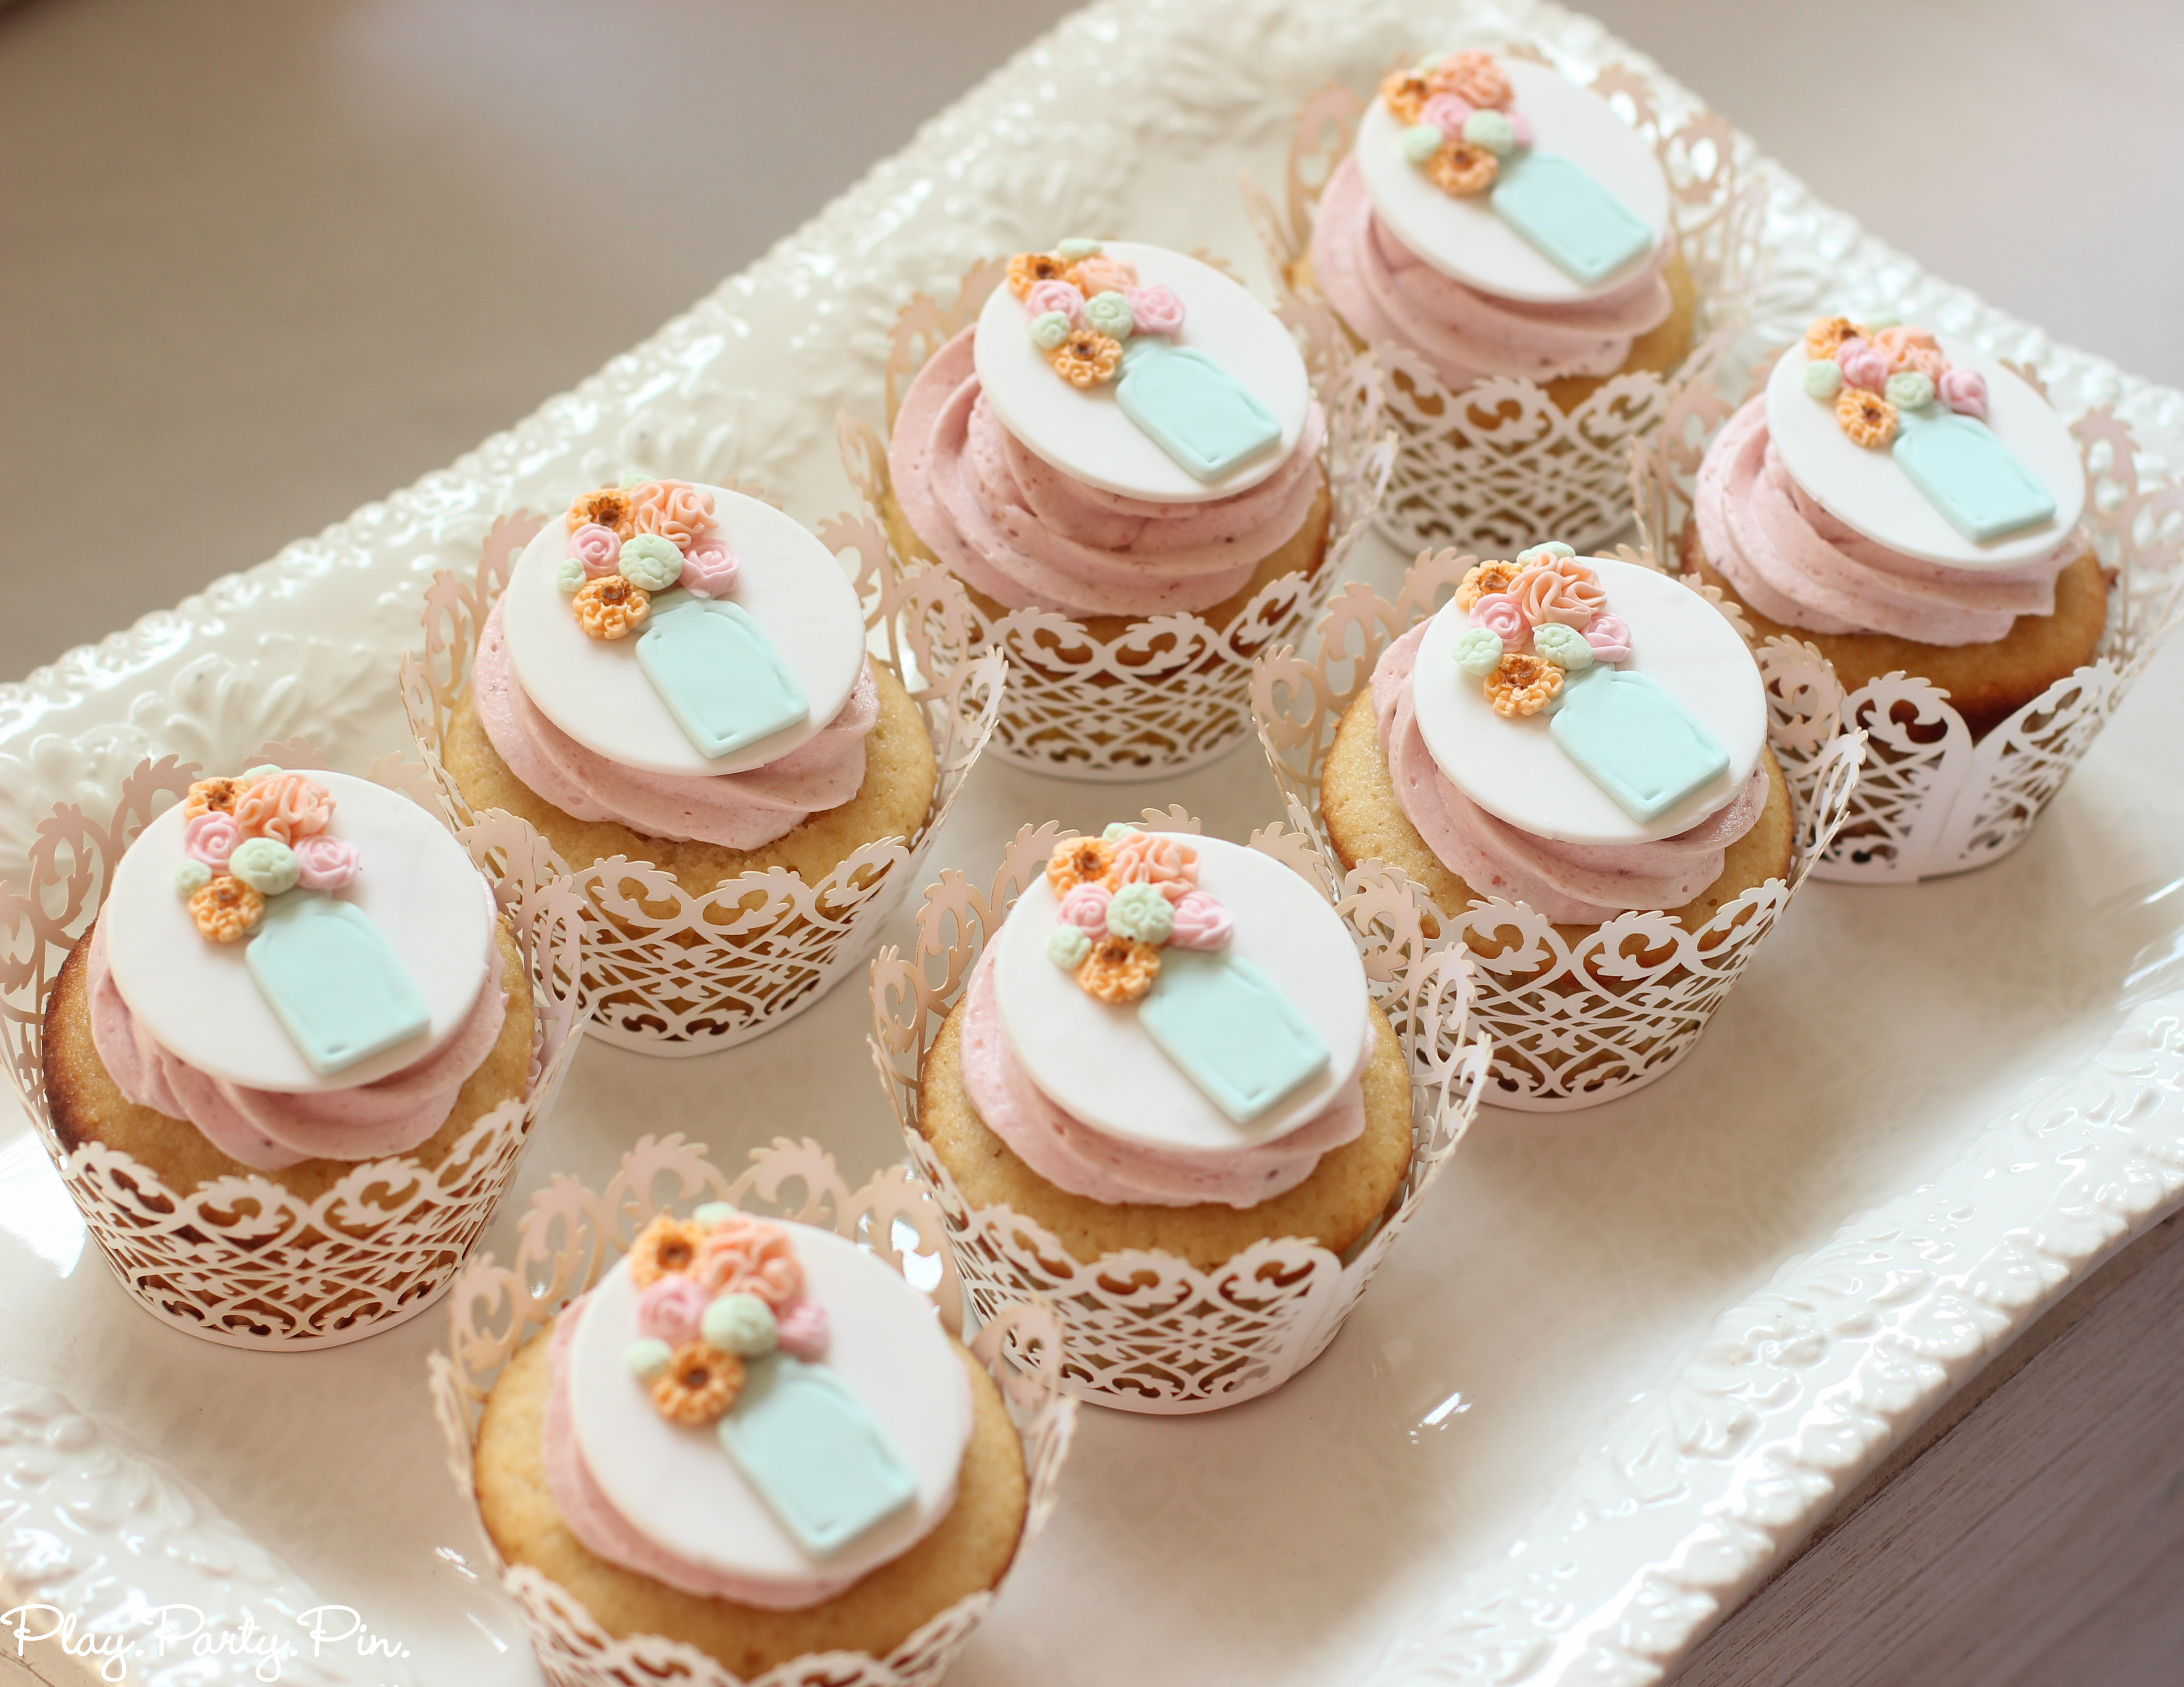 Bridal Shower Cupcakes  Blushing Bride Bridal Shower Play Party Plan